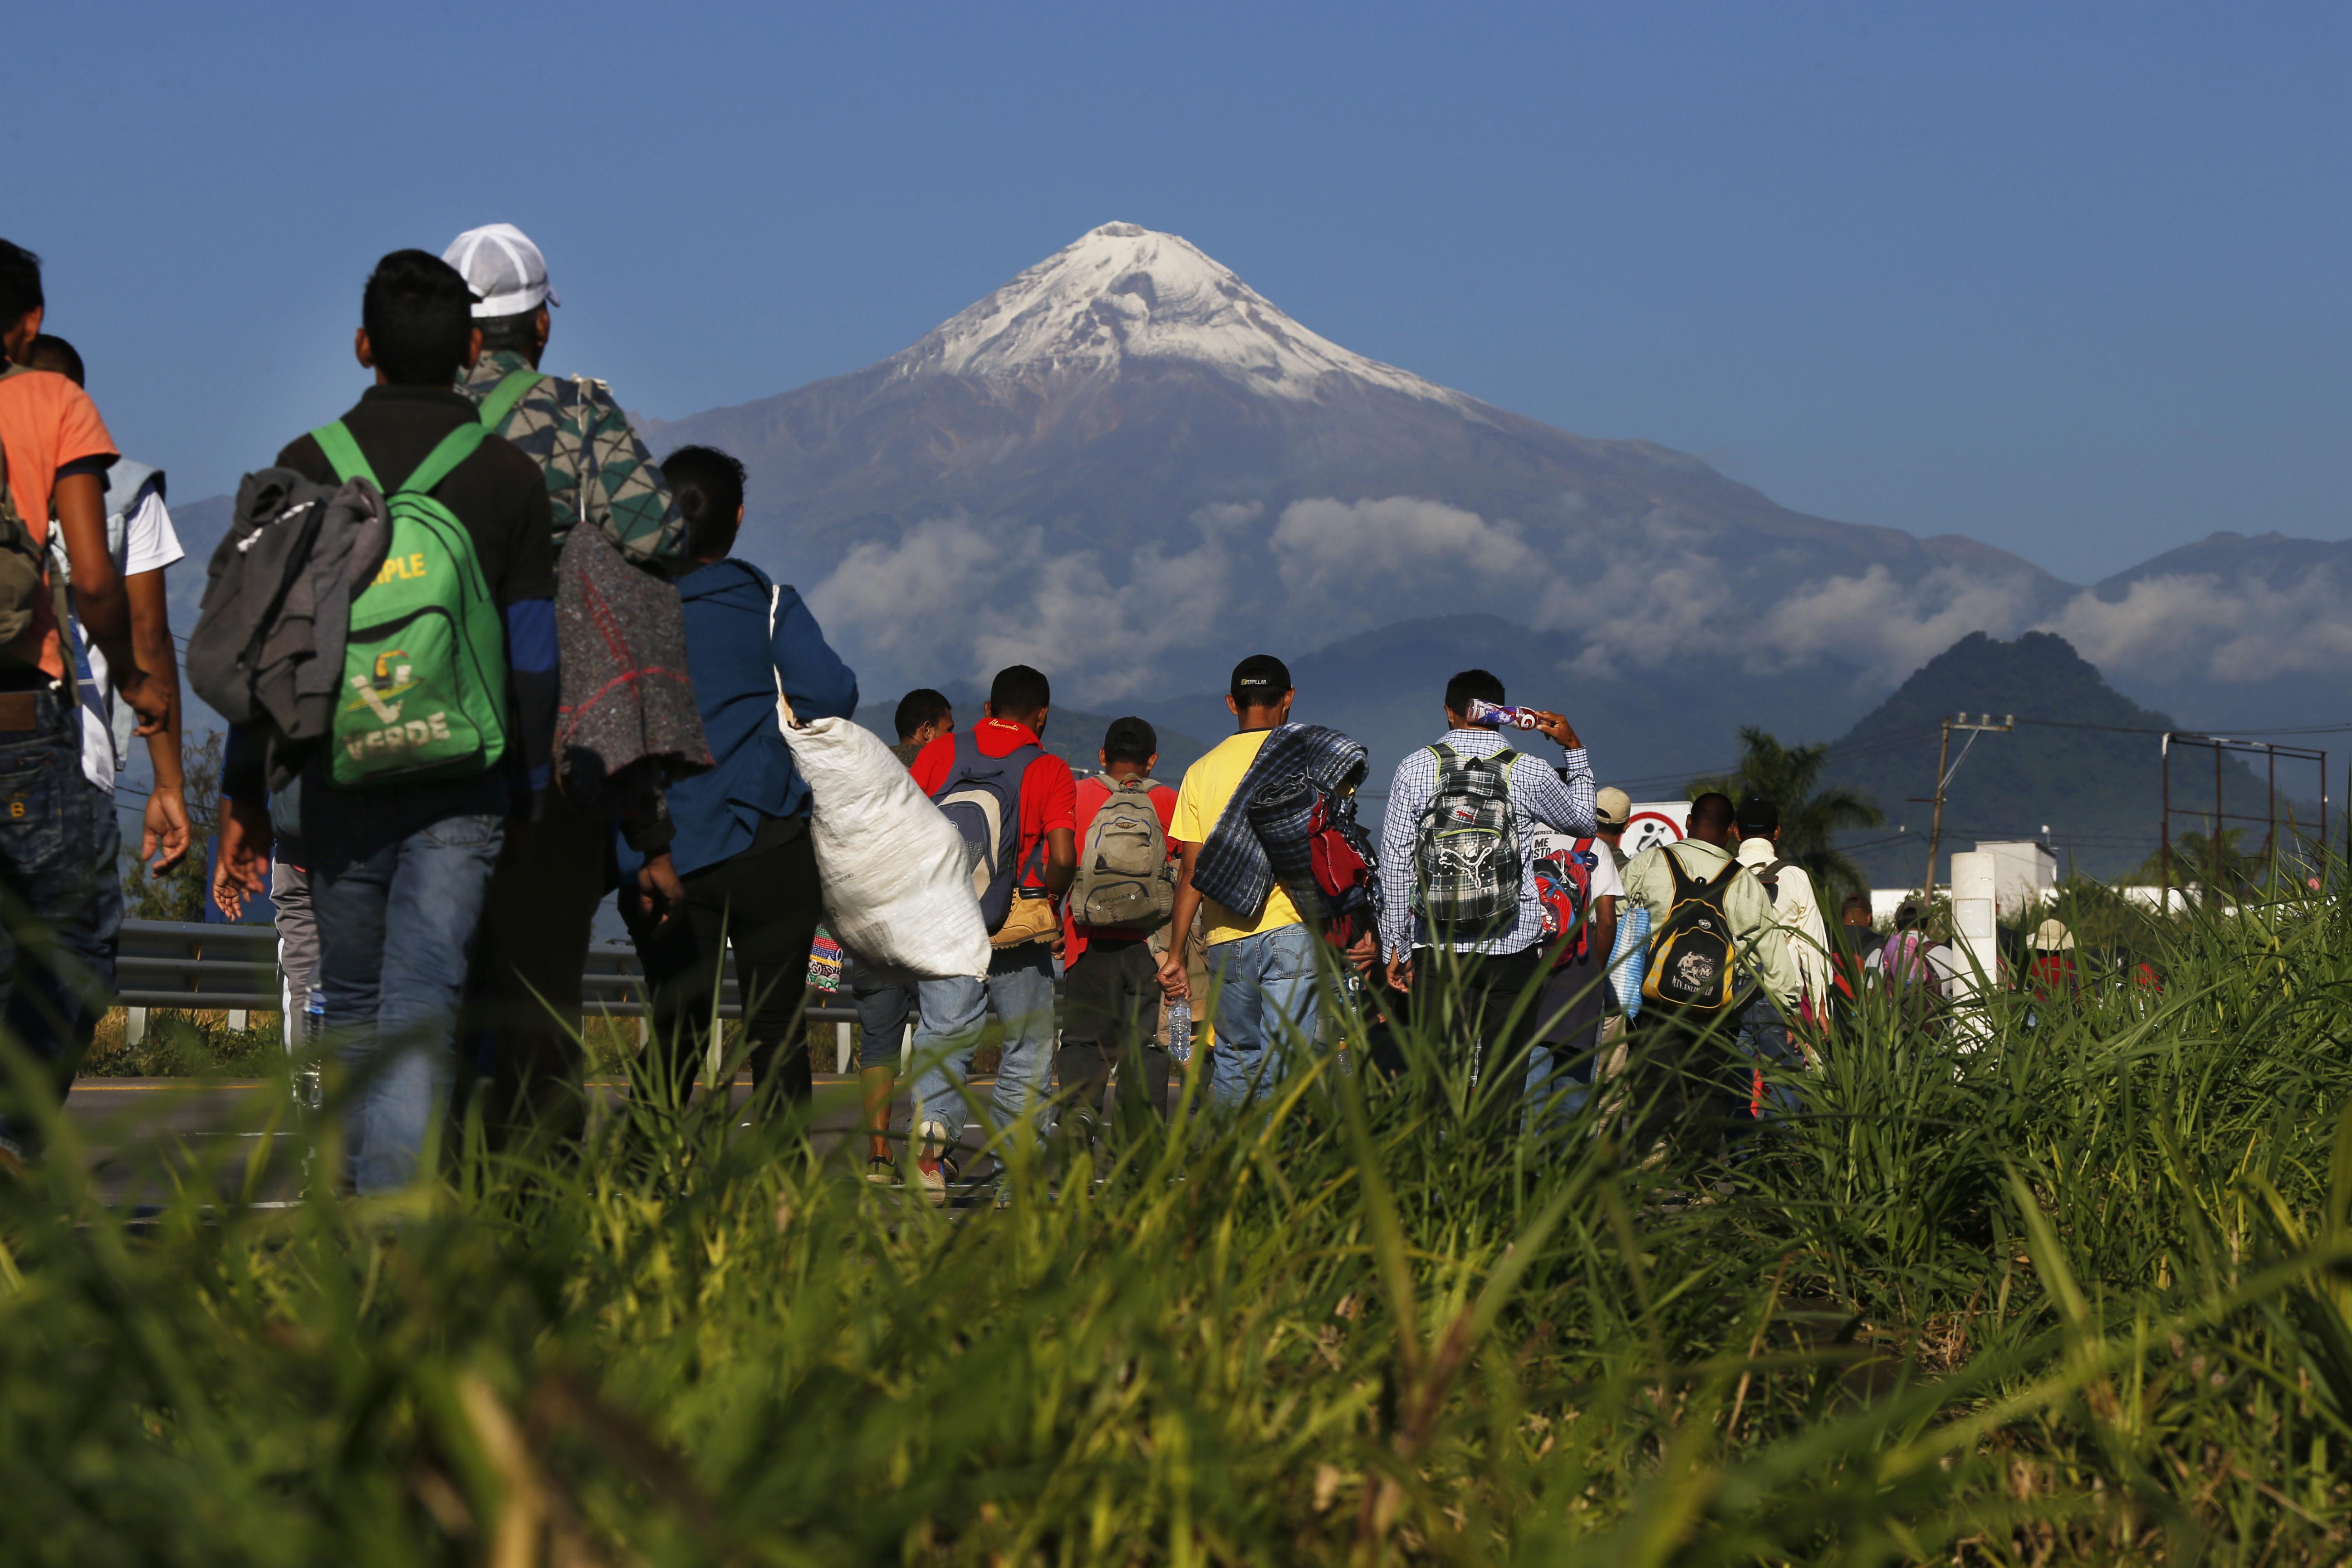 New migrant caravan of 2,500 gets cool reception in Mexico